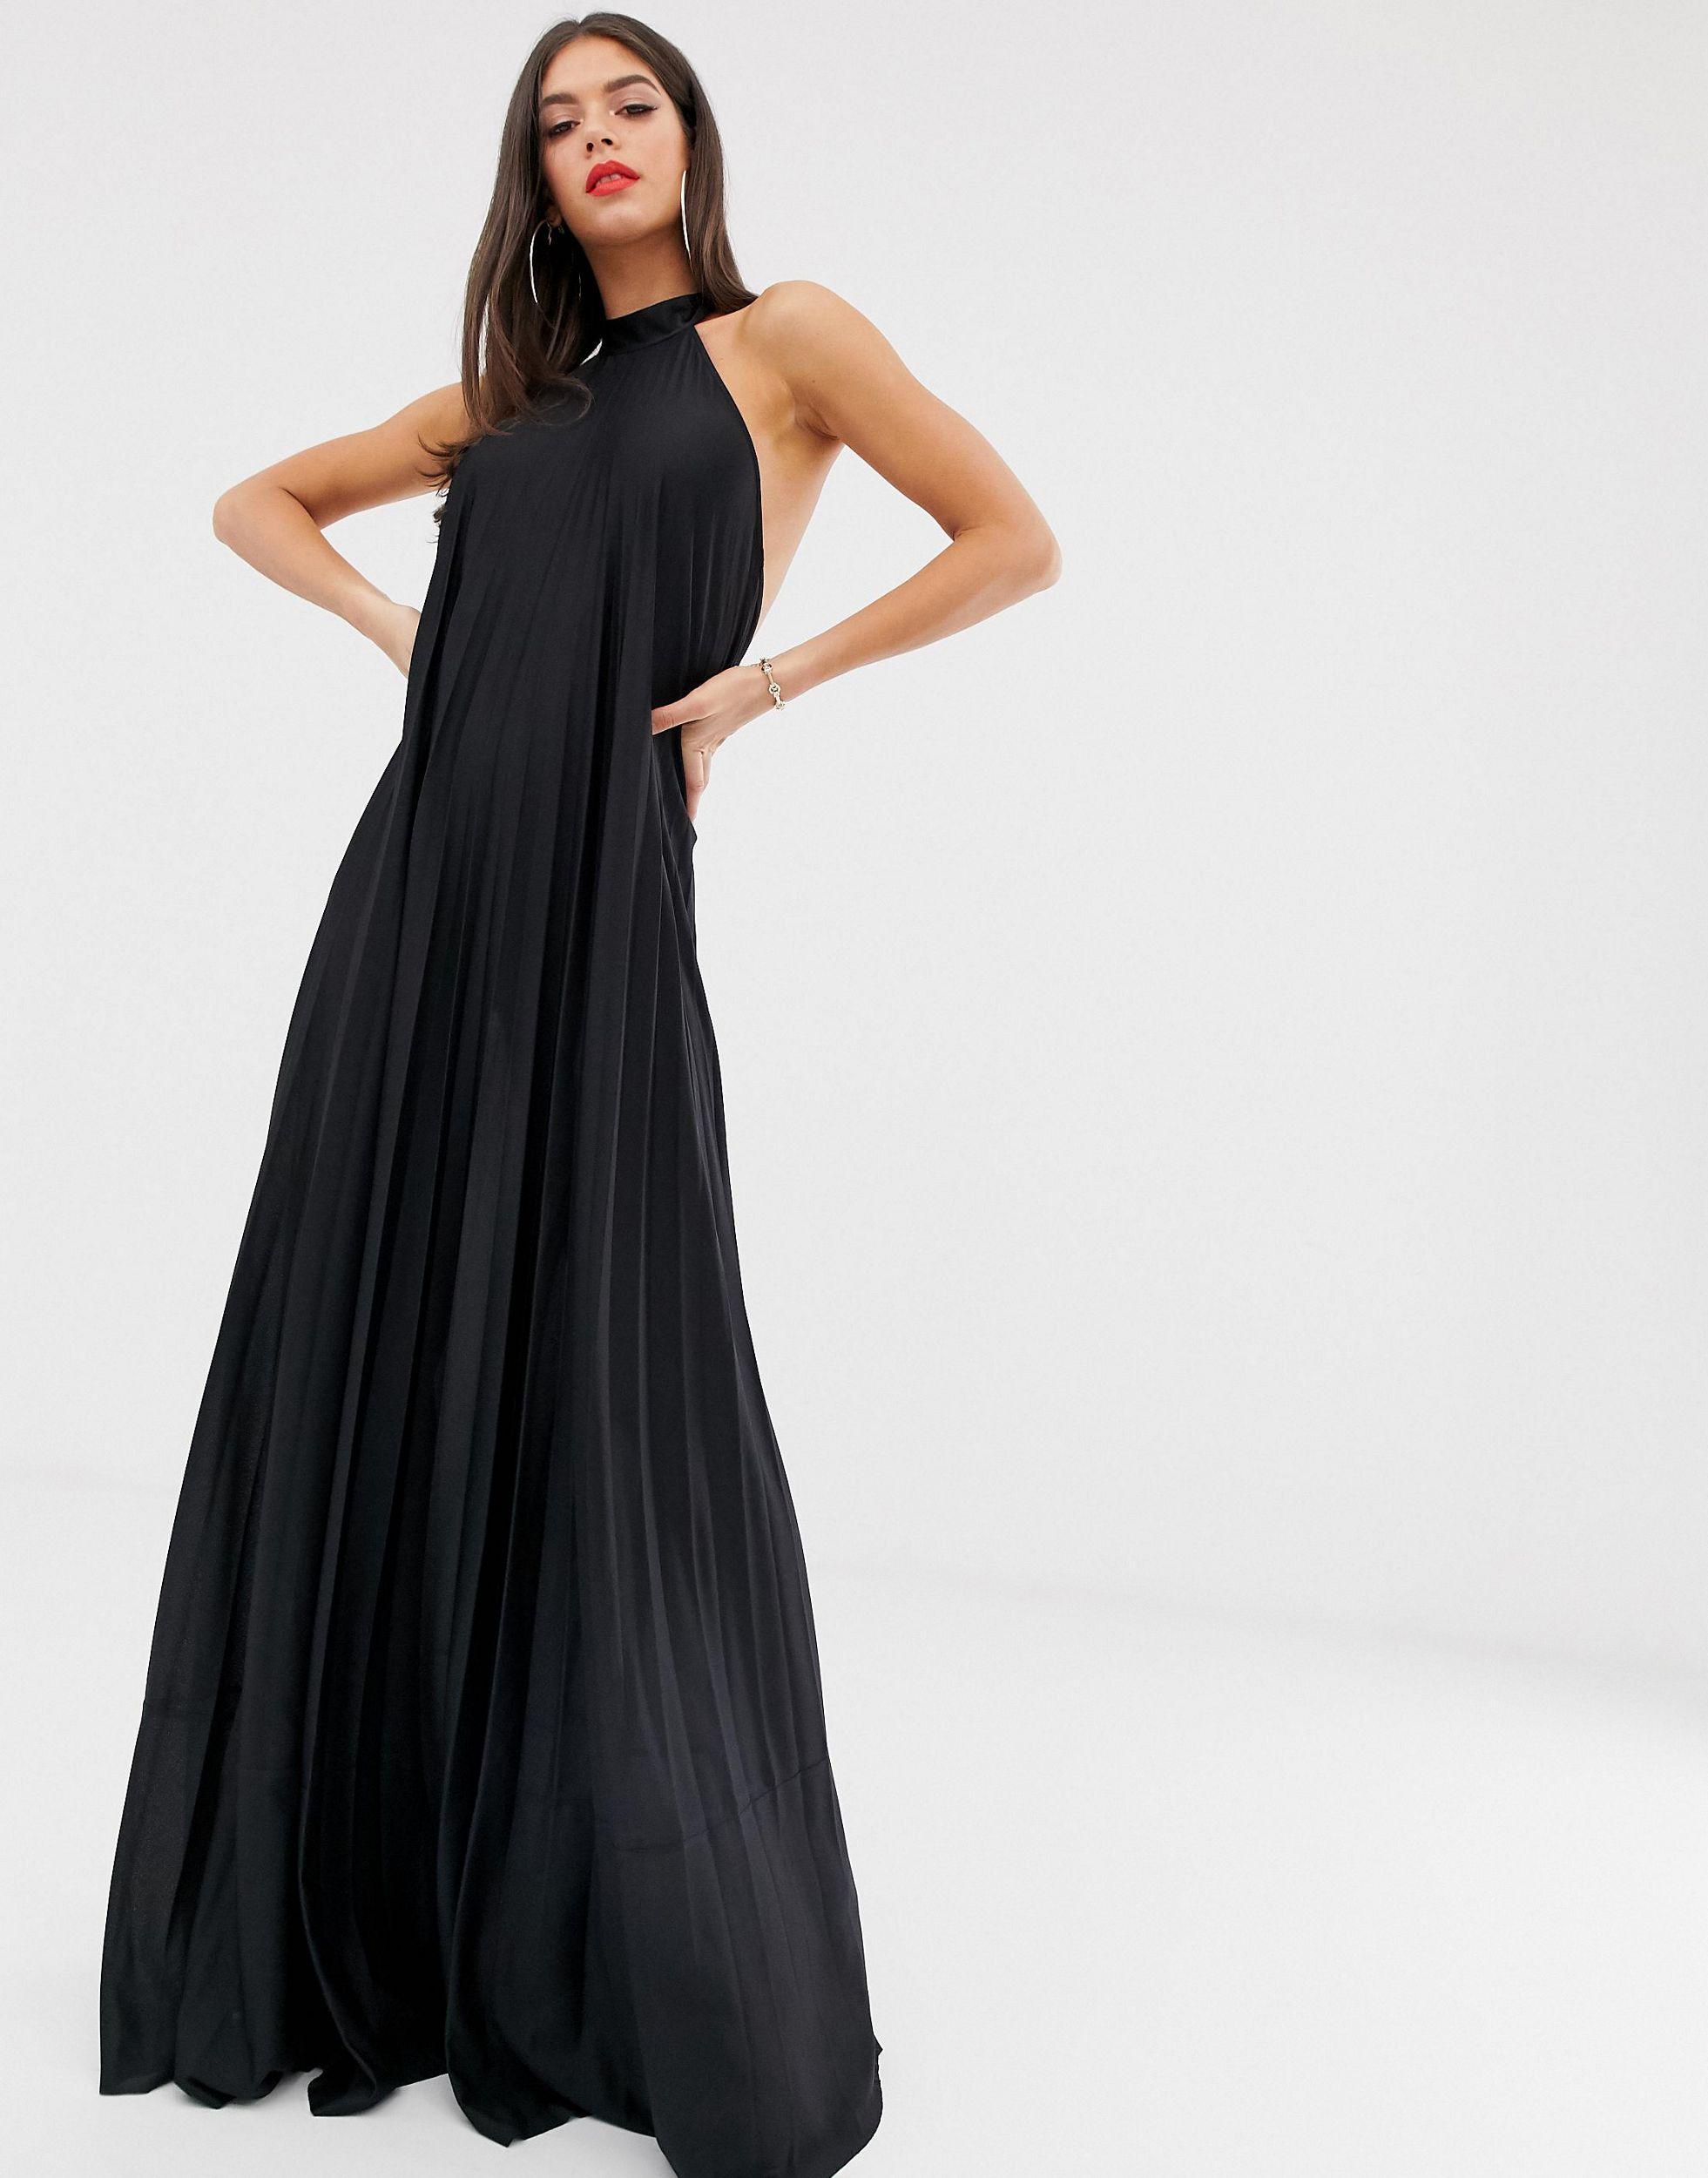 ASOS DESIGN Tall - Robe longue plissée dos nu Synthétique ASOS en coloris Noir